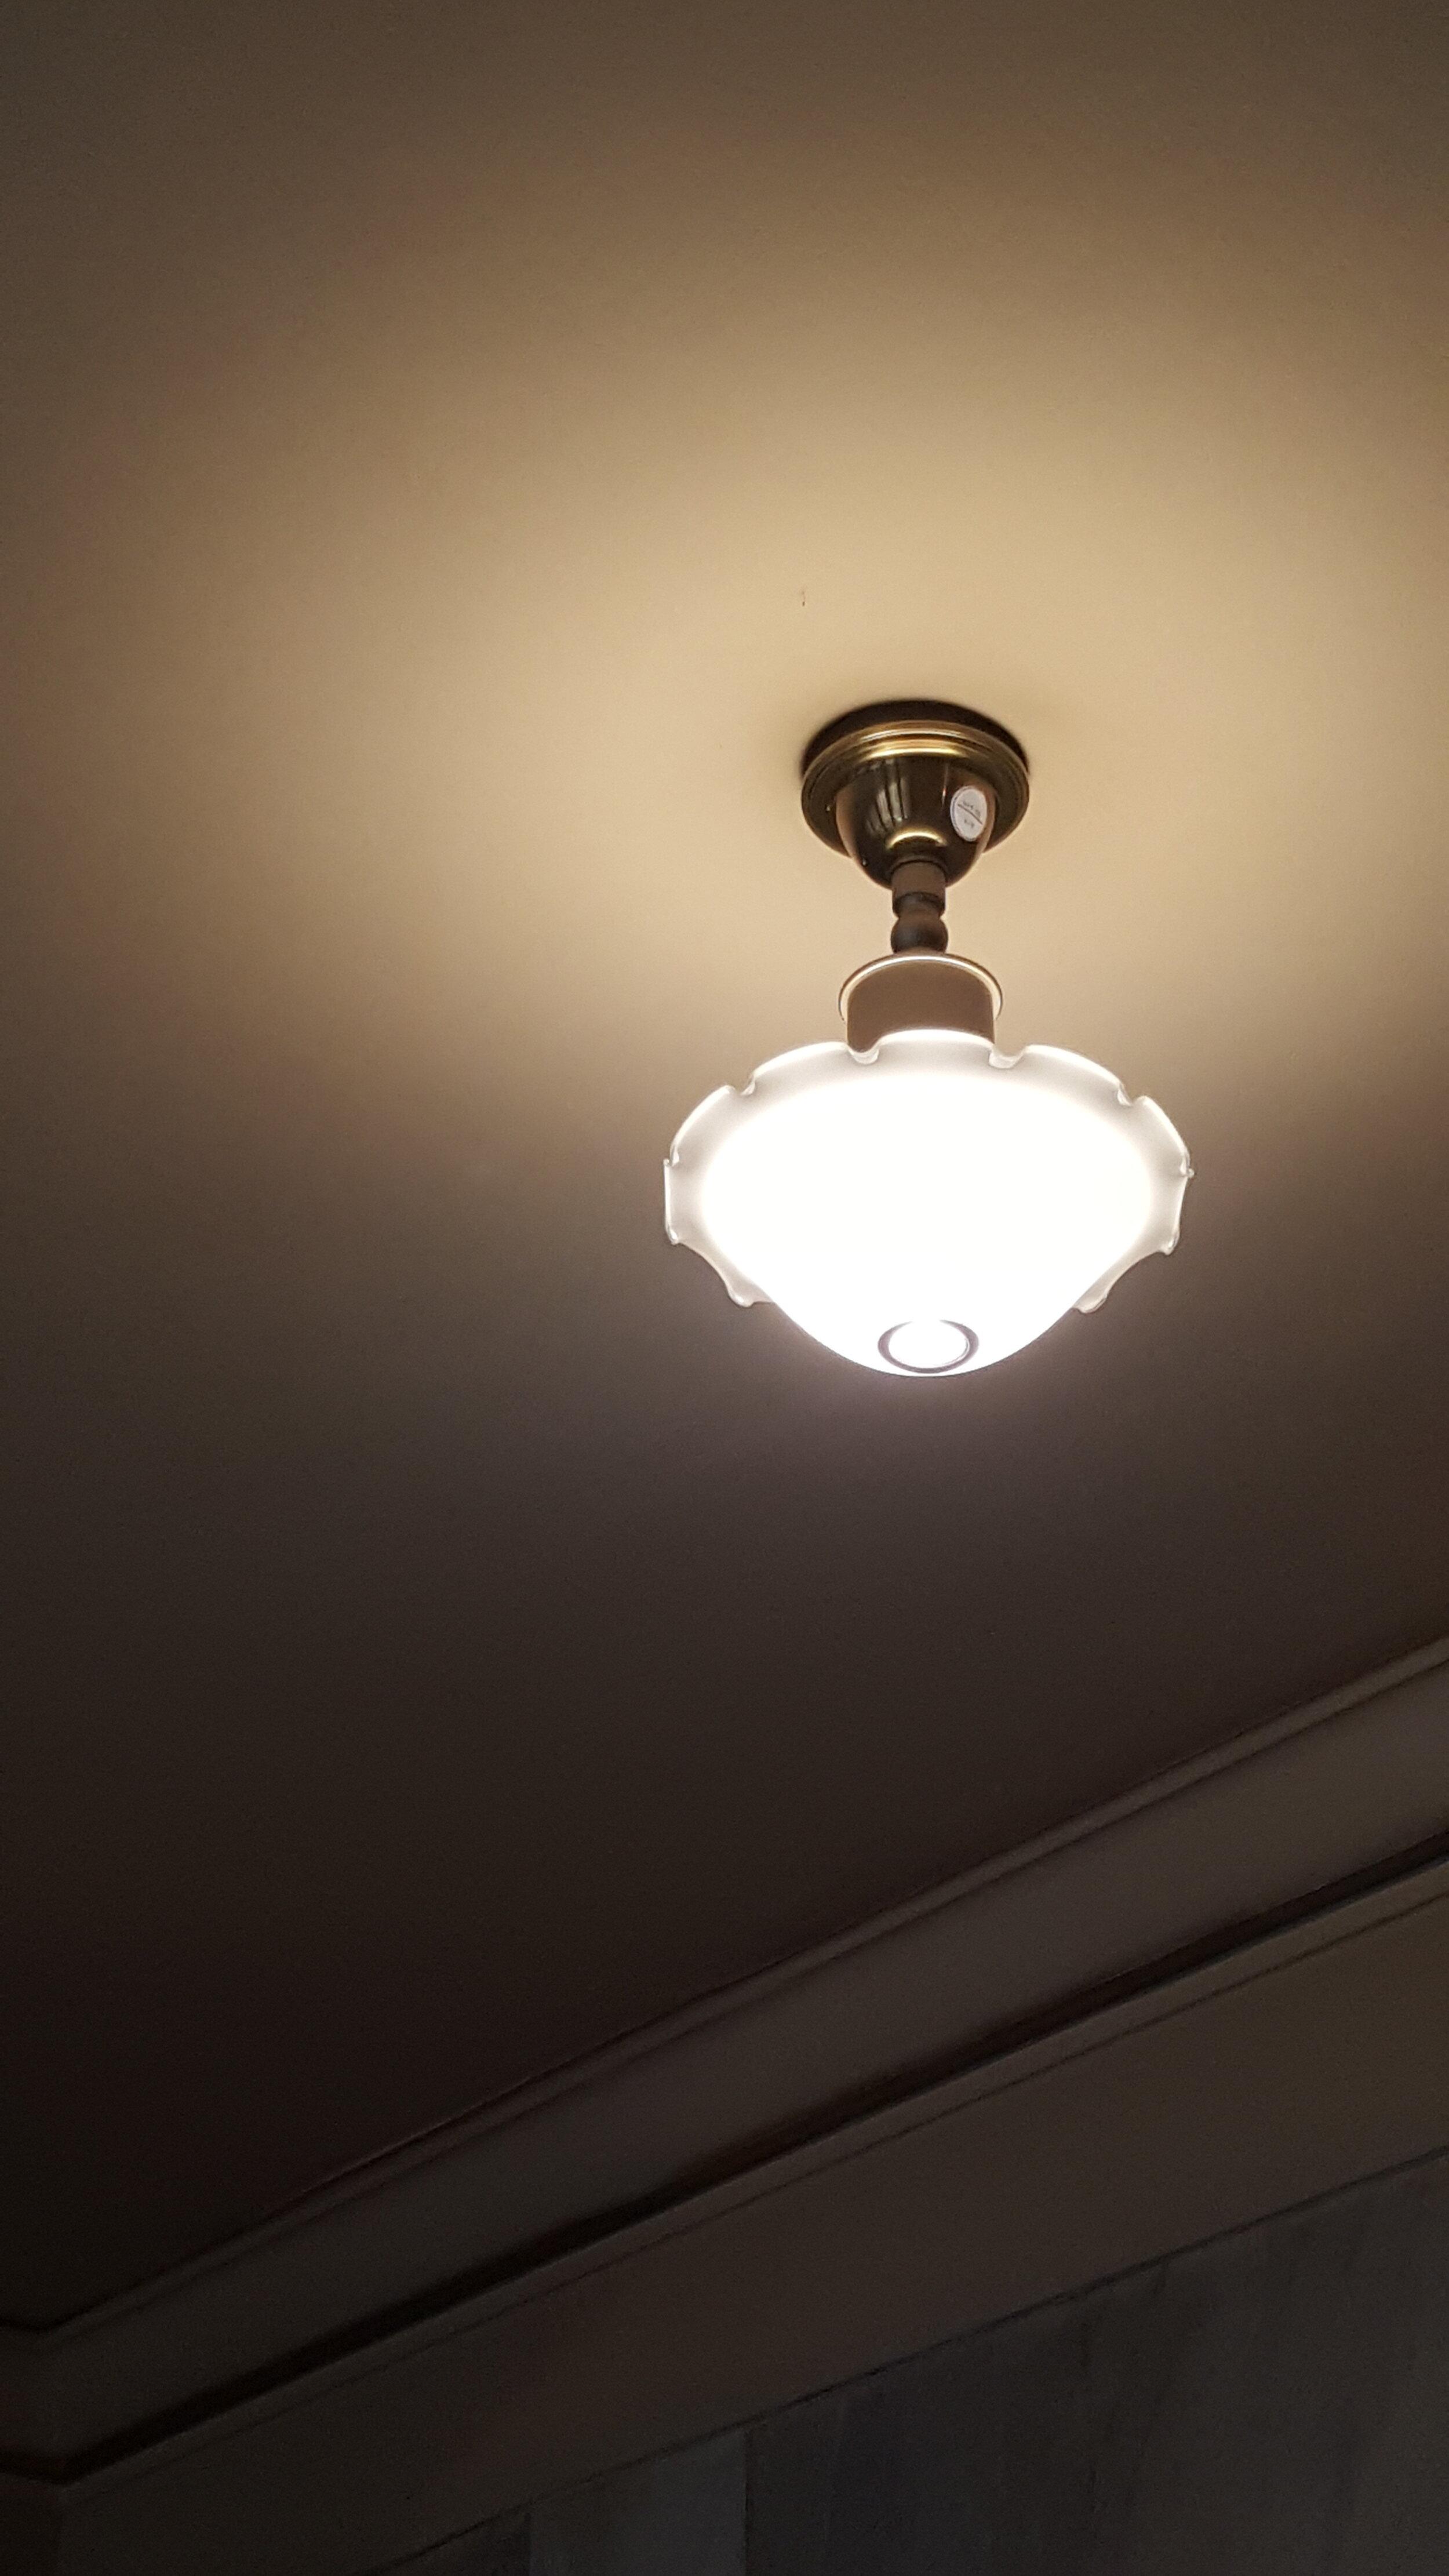 de schutter bespoke lighting fixtures